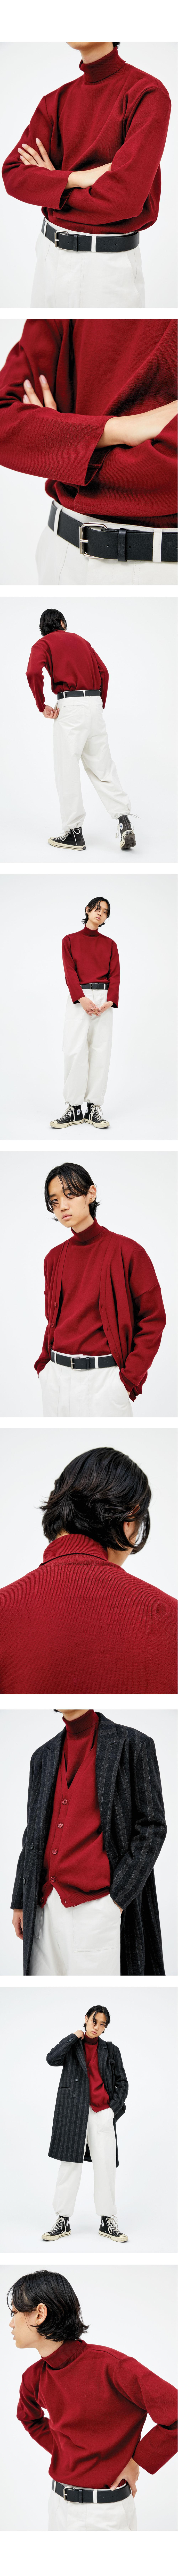 cozy mood turtleneck knit - men